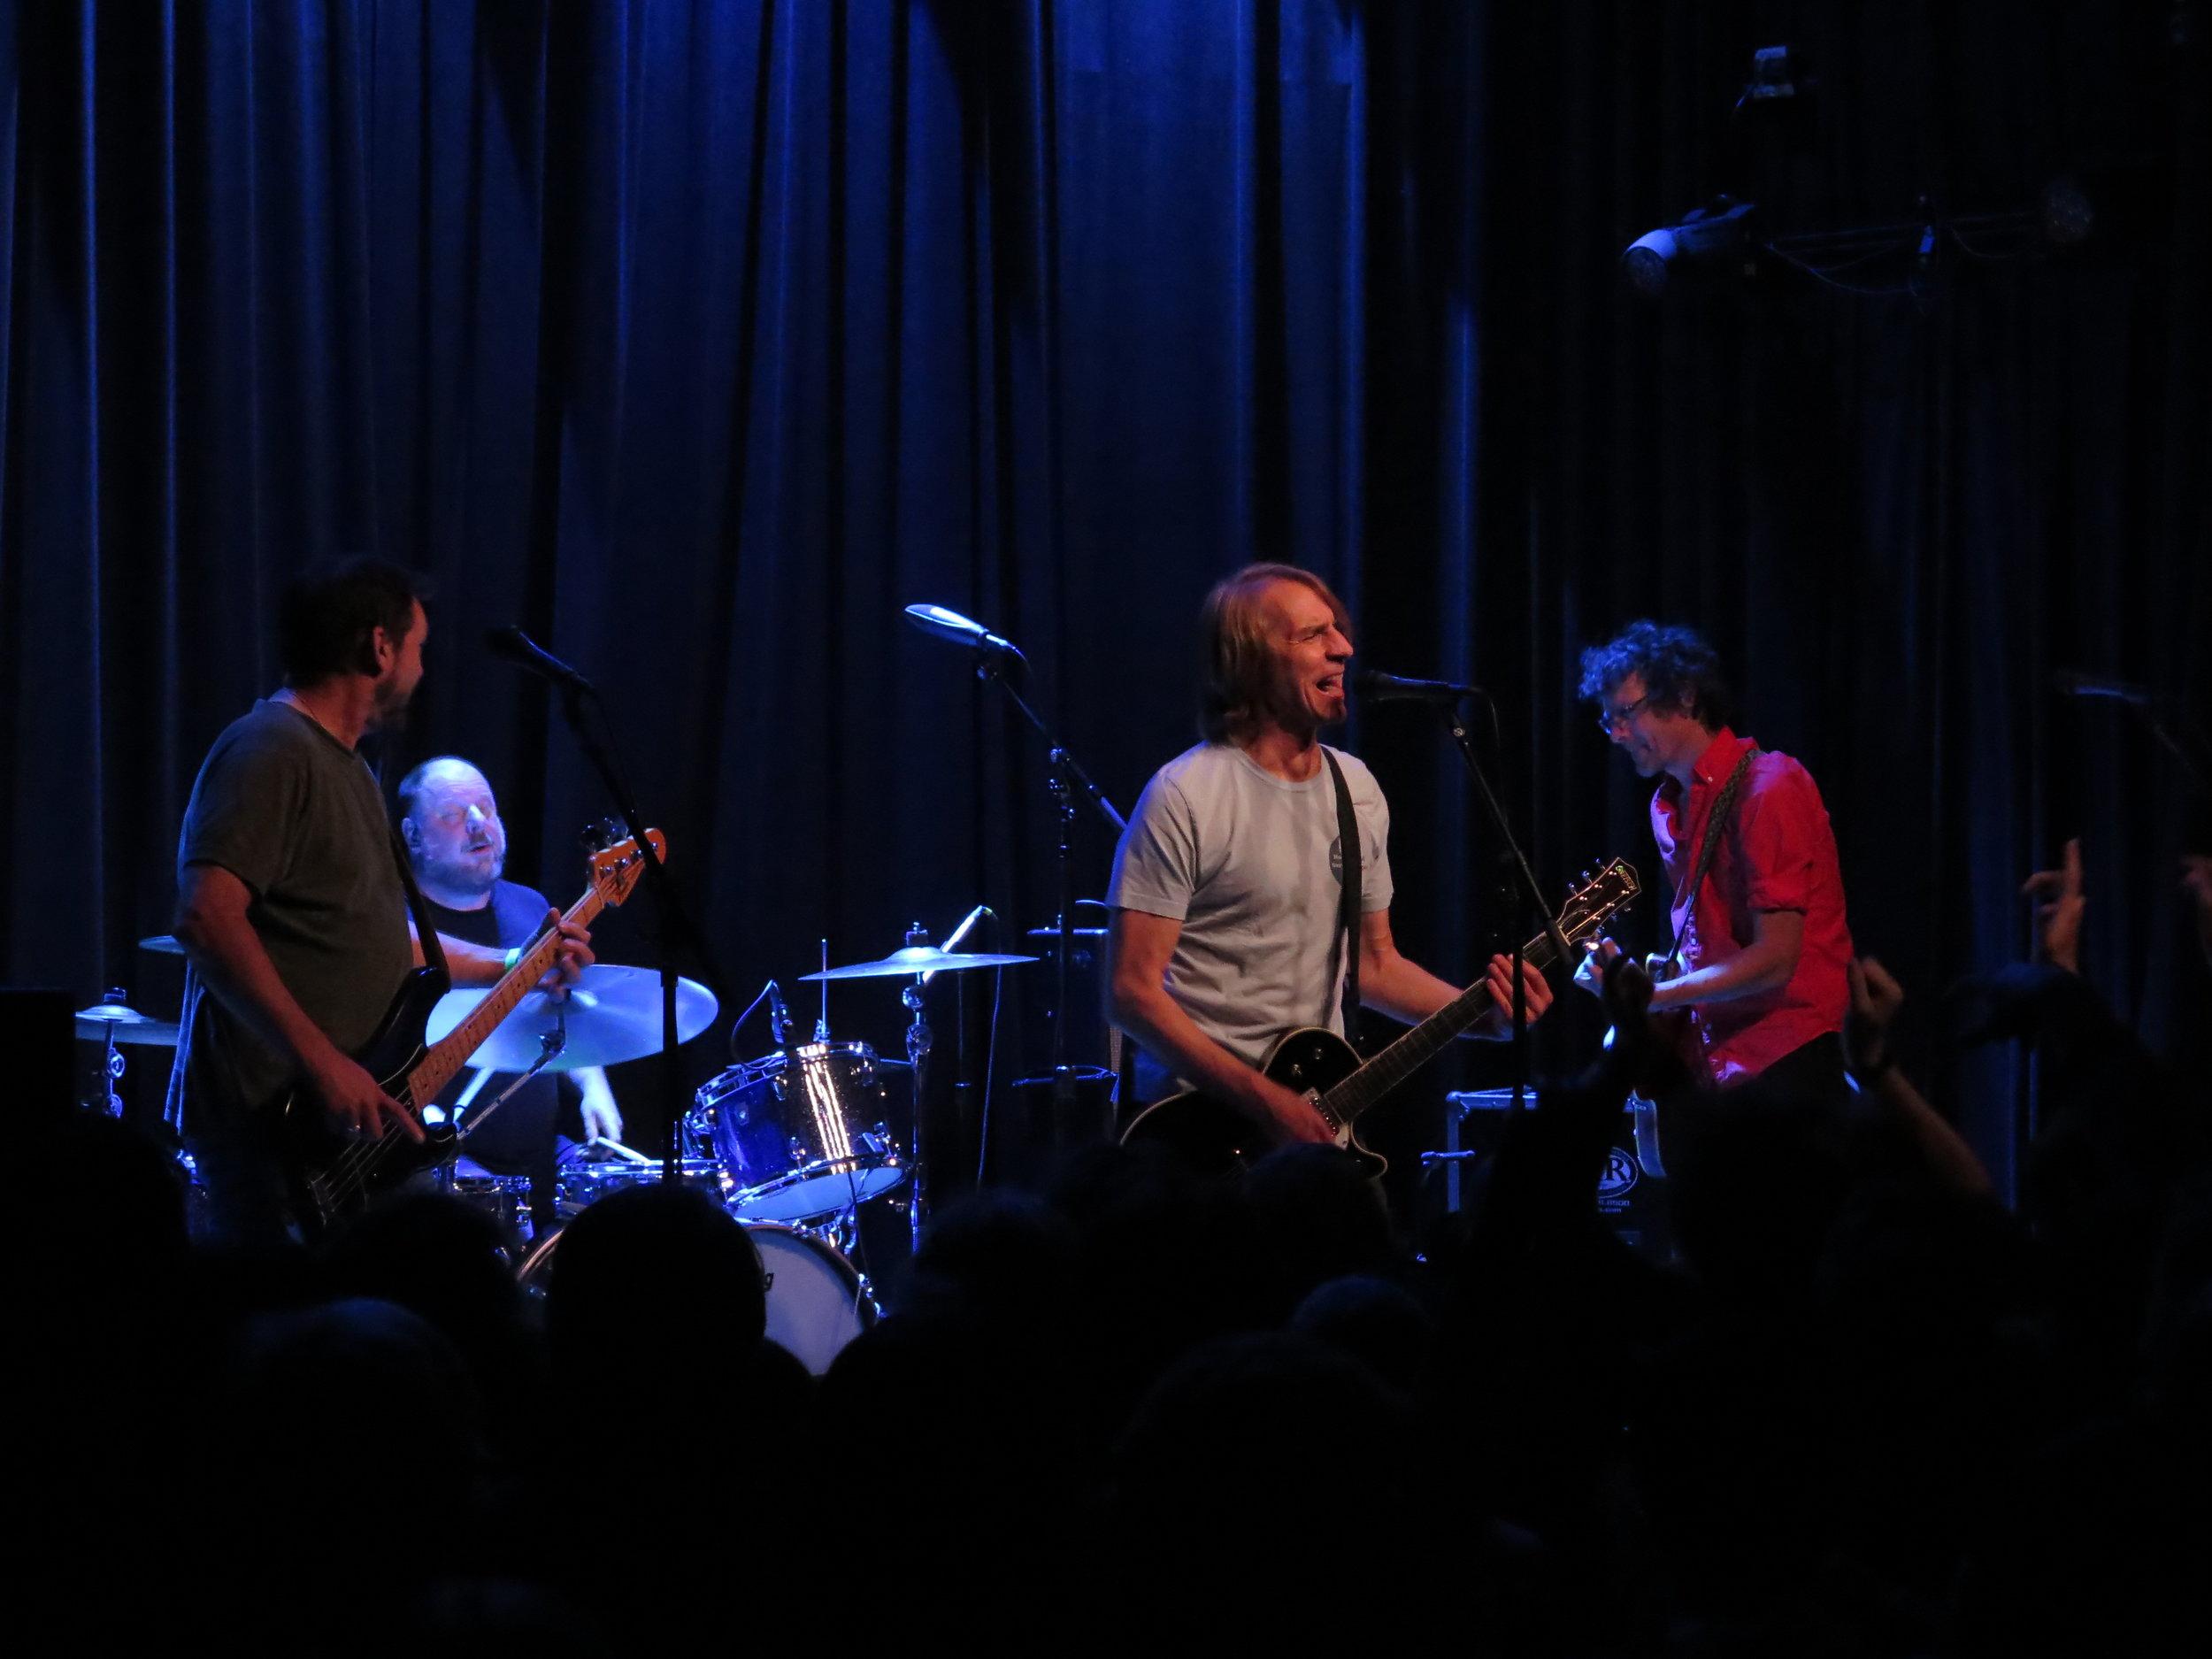 Mudhoney / Metz - Lincoln HallMay 26th